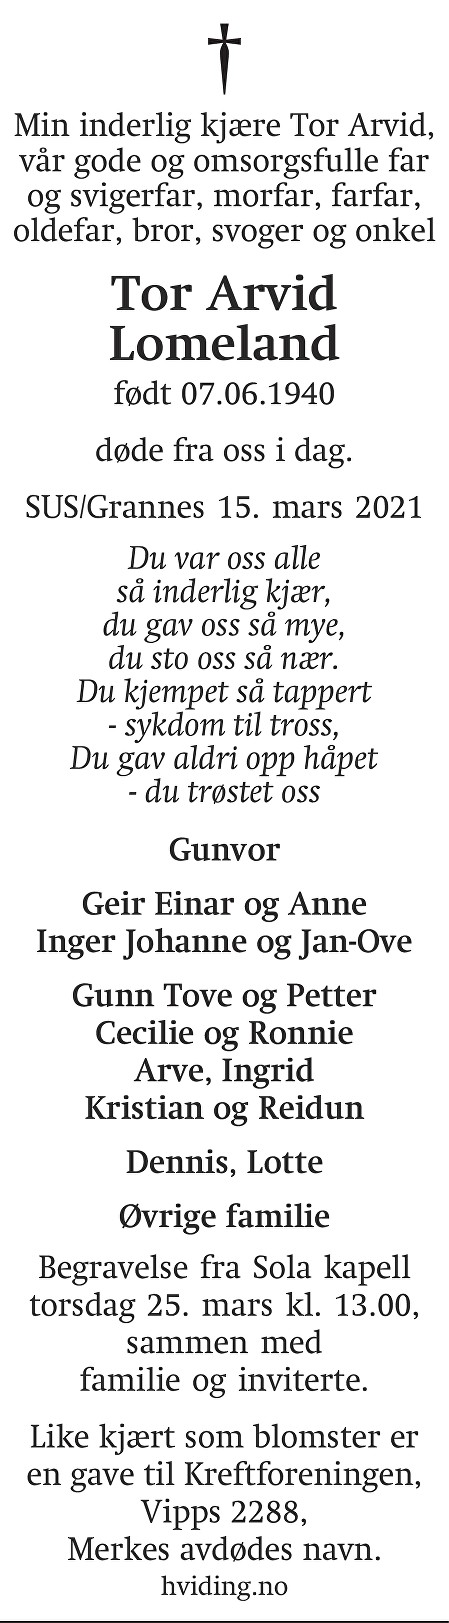 Tor Arvid Lomeland Dødsannonse